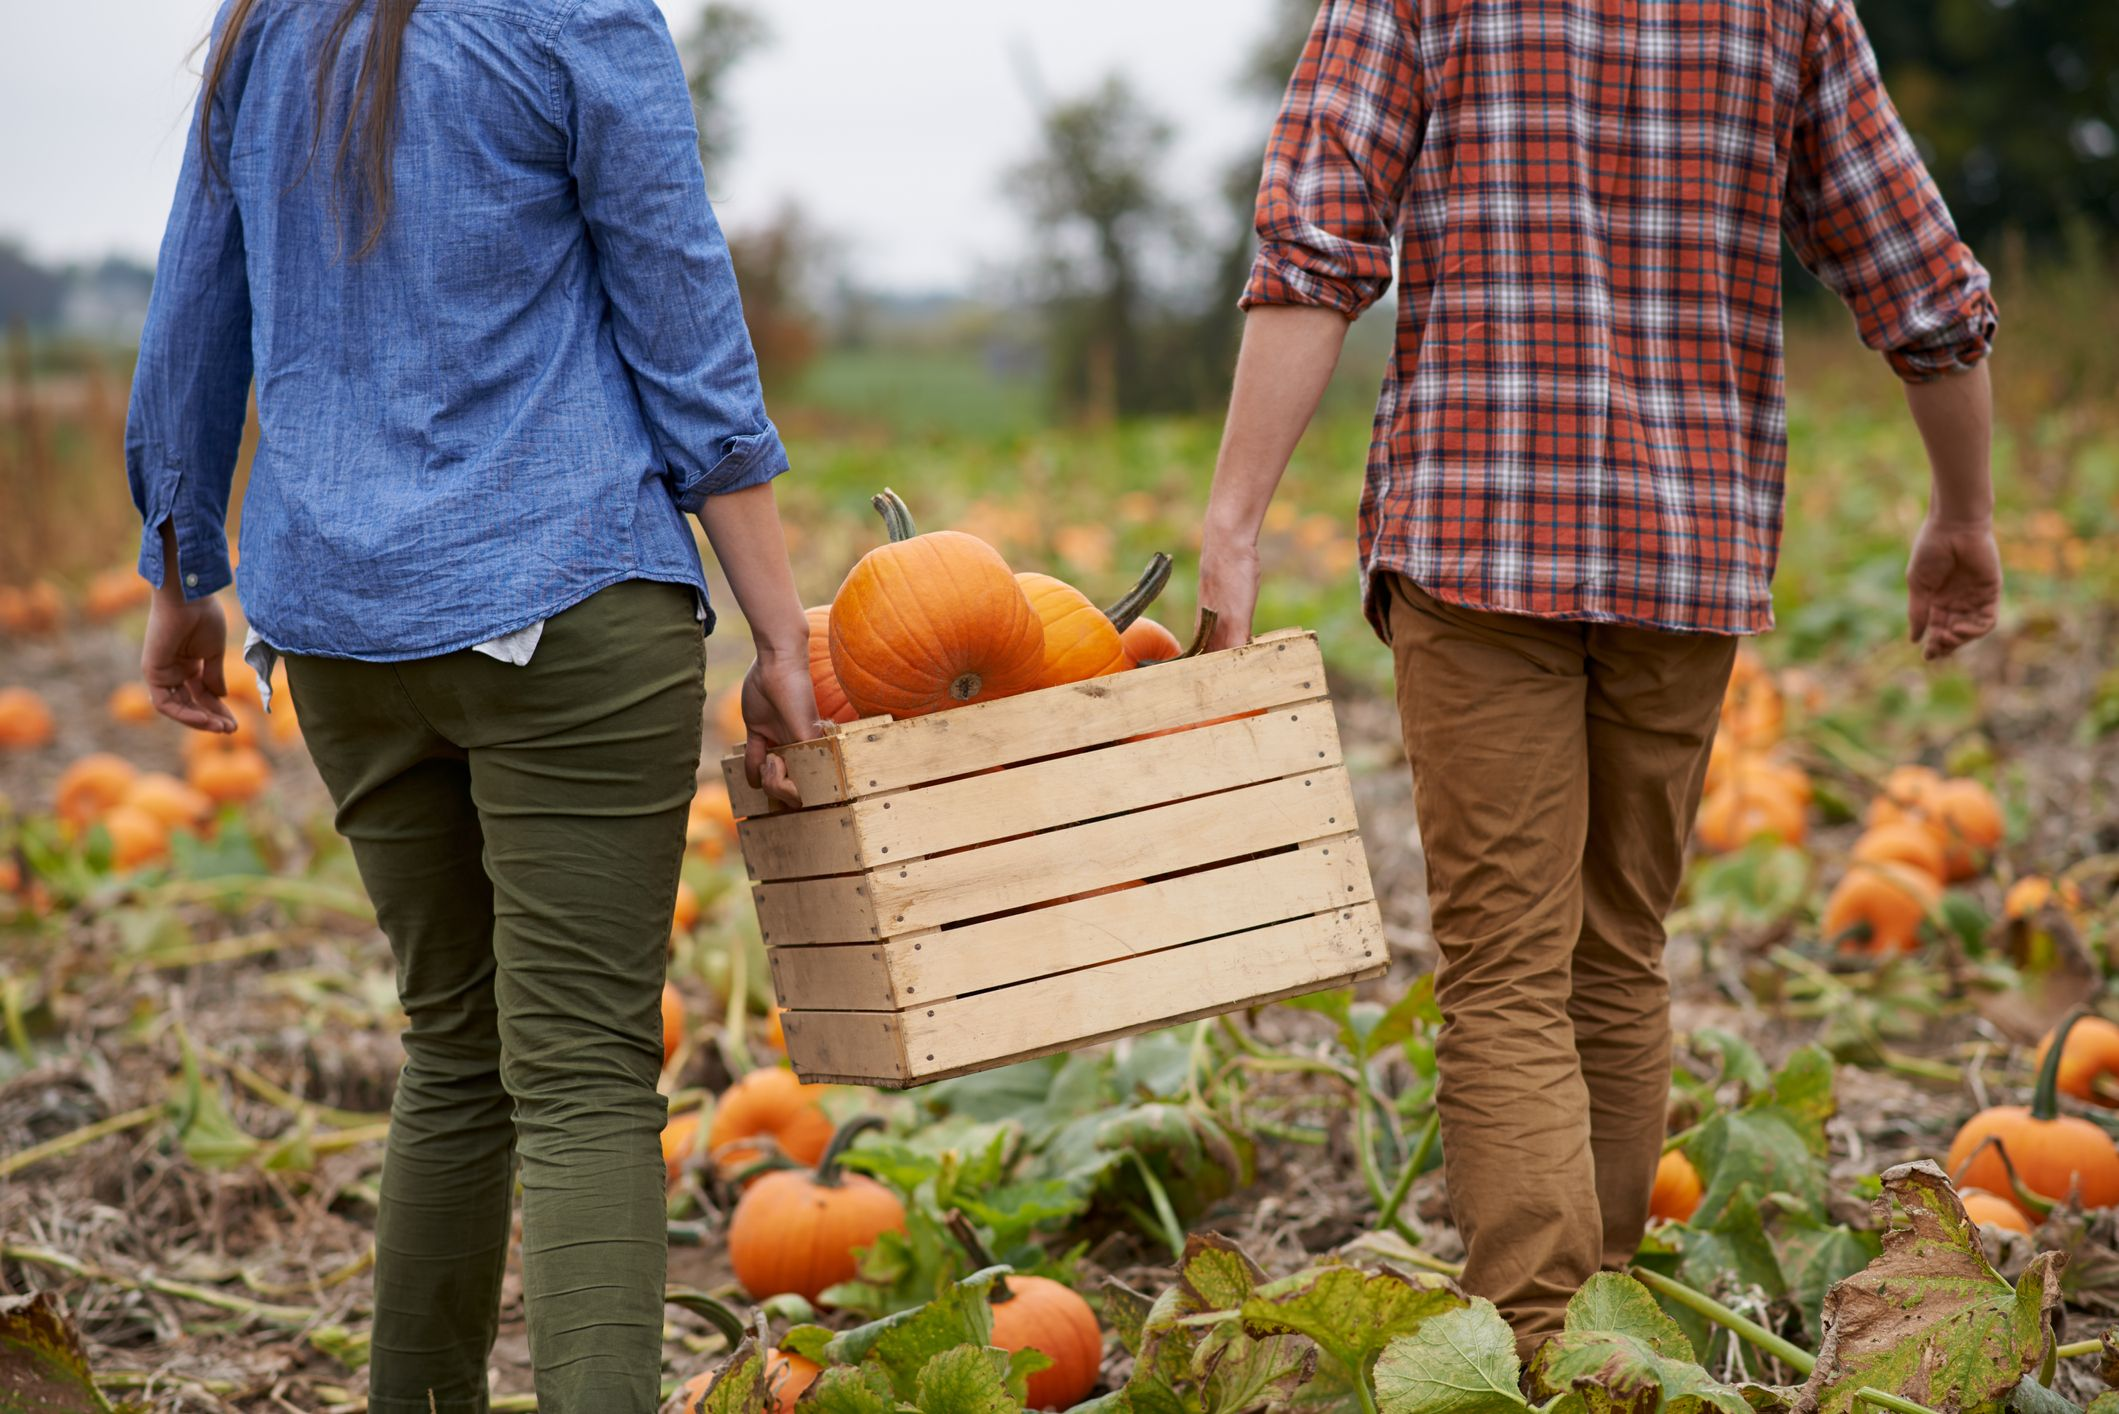 30 Romantic Fall Date Ideas That Go Beyond the Pumpkin Patch